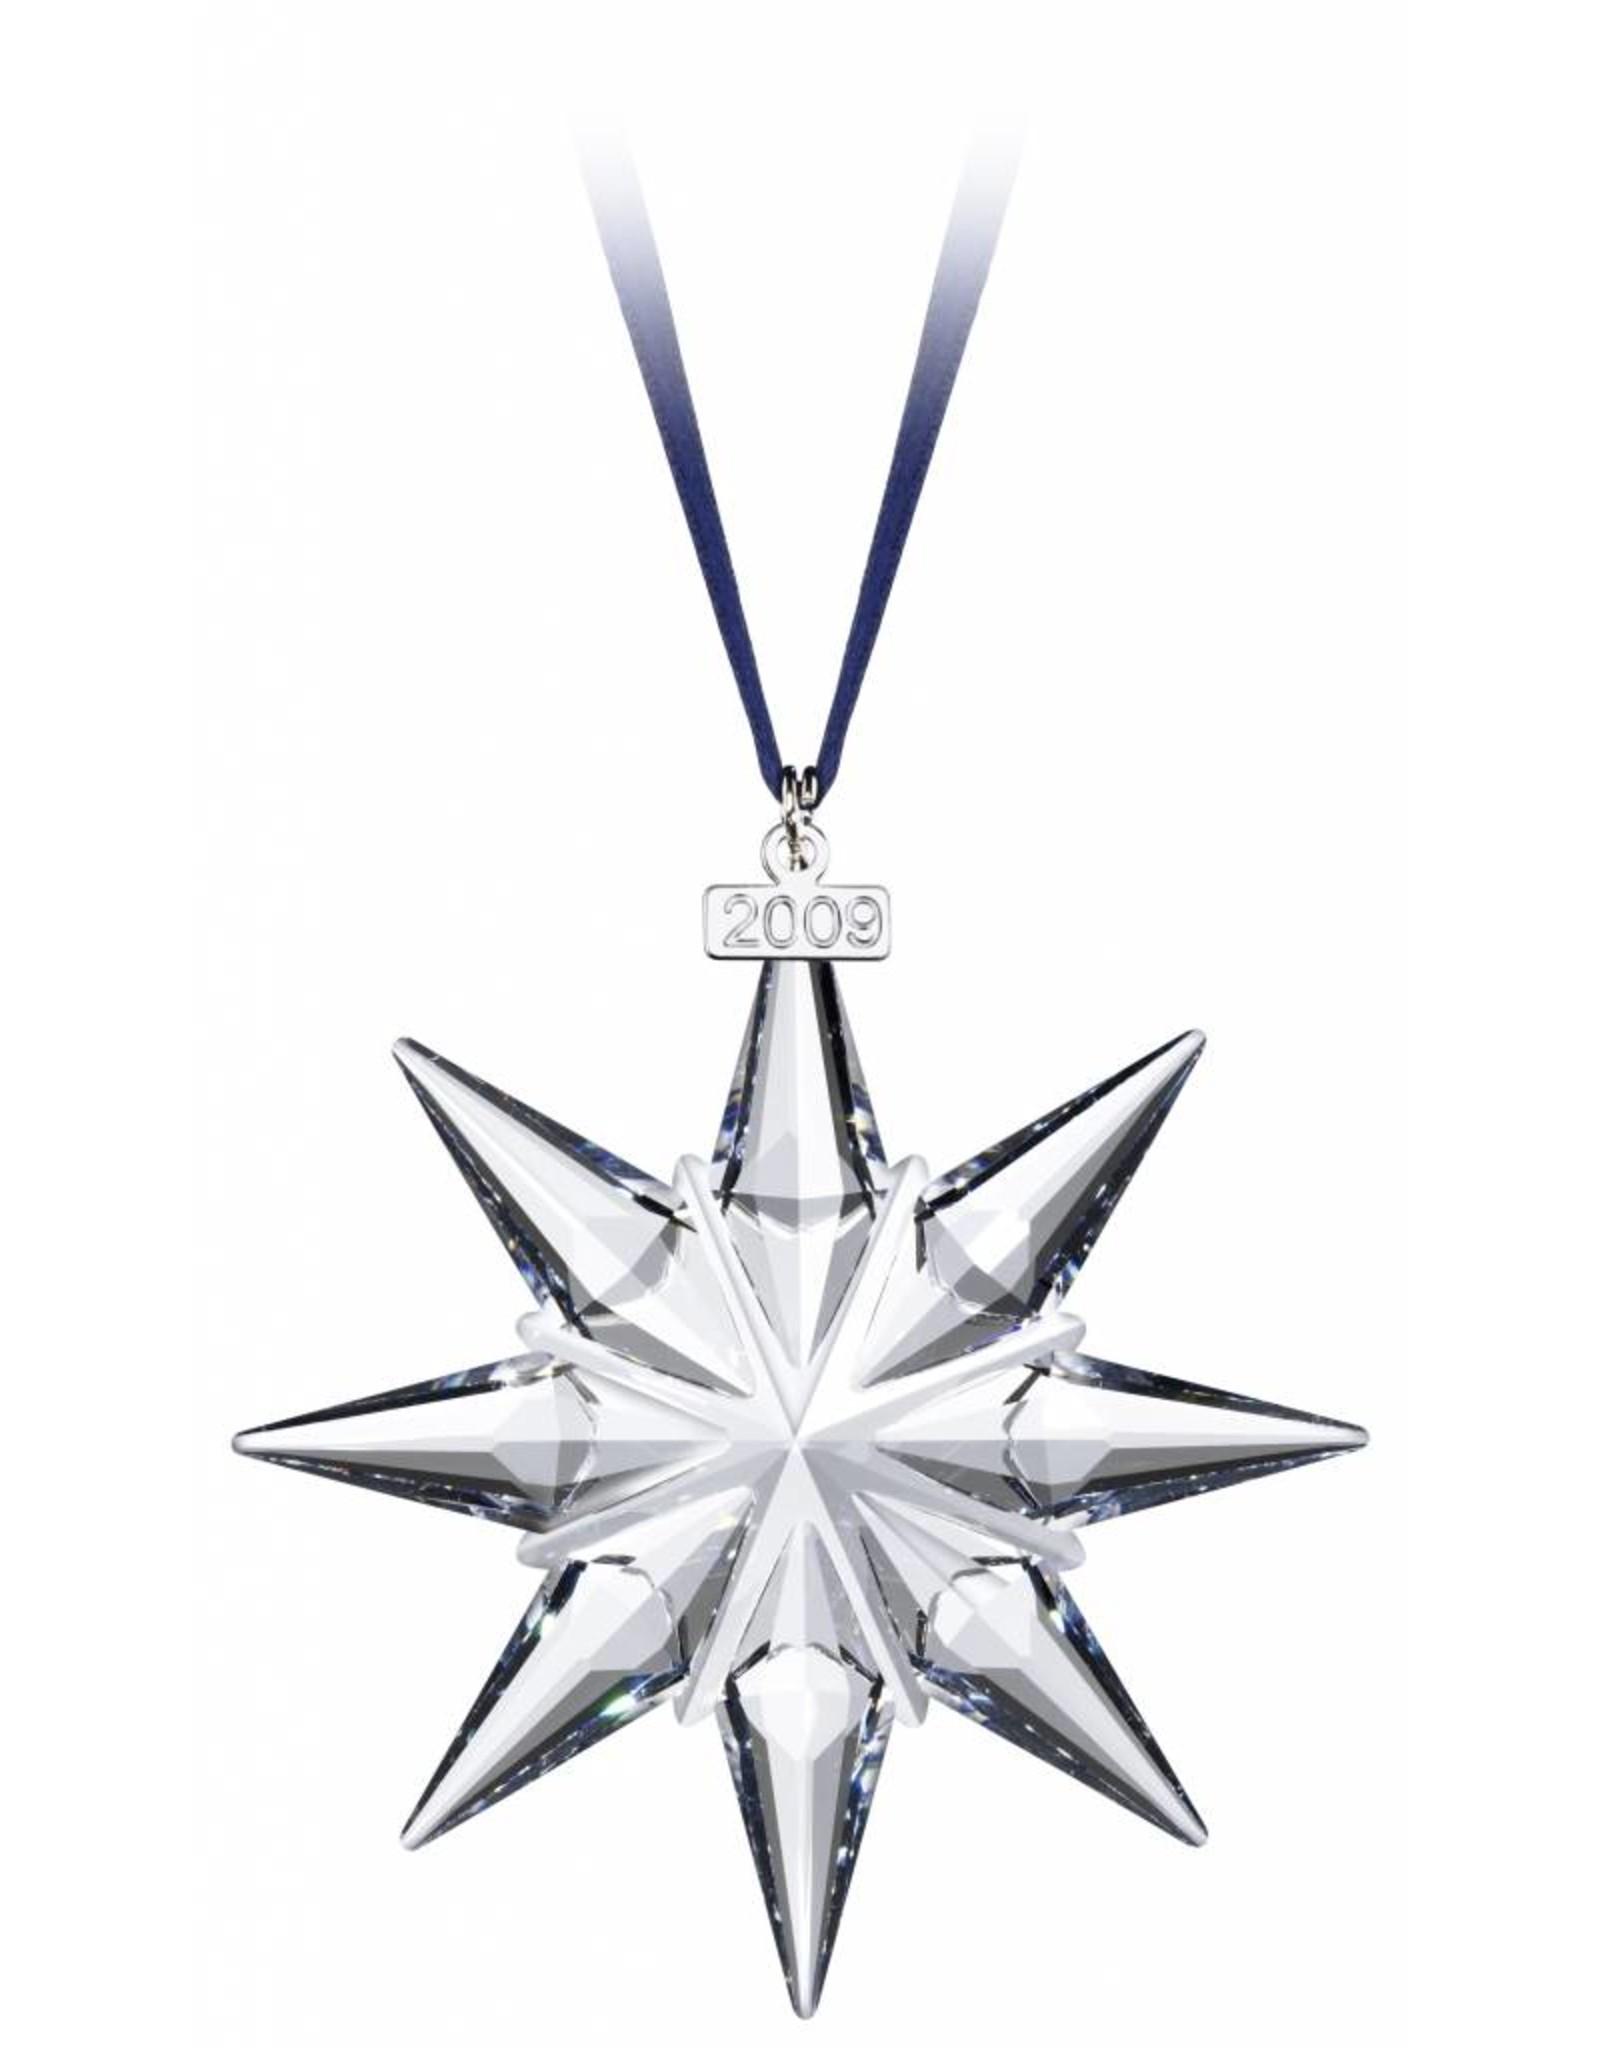 Swarovski Swarvoski Christmas Ornament 2009